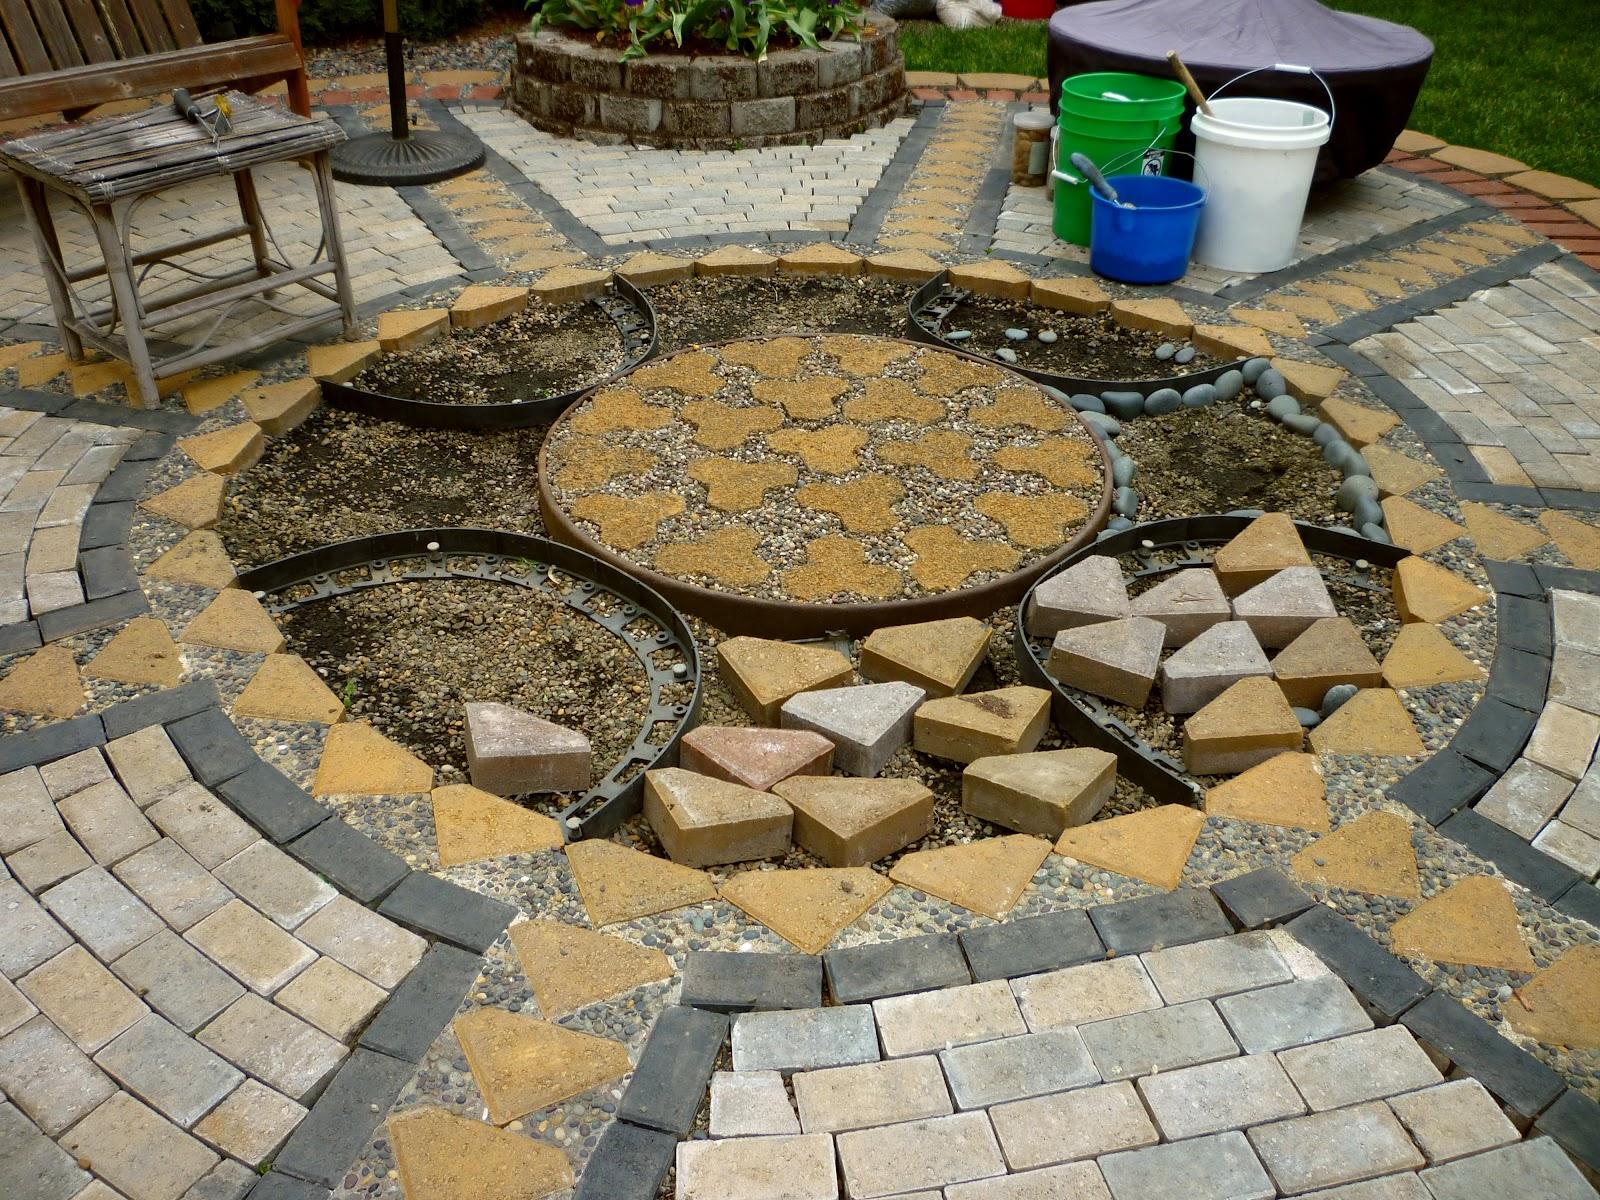 Creating A Paver And Pebble Mosaic Patio